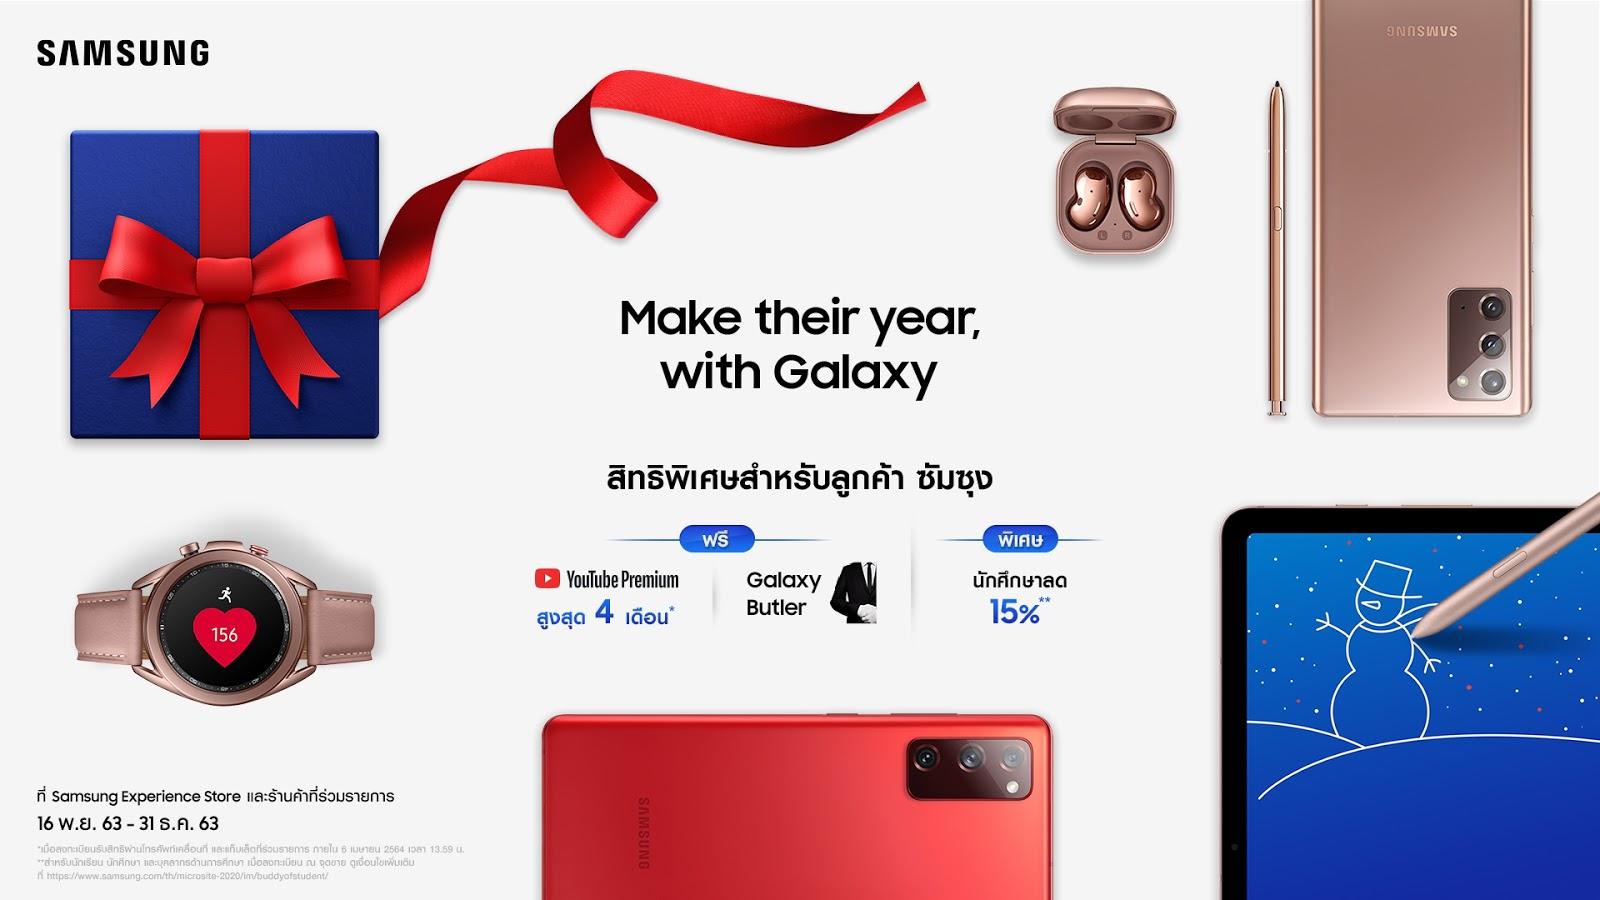 Make their year, with Galaxy กับโปรโมชั่นสุดพิเศษส่งท้ายปีถึง 31 ธันวานี้จาก Samsung